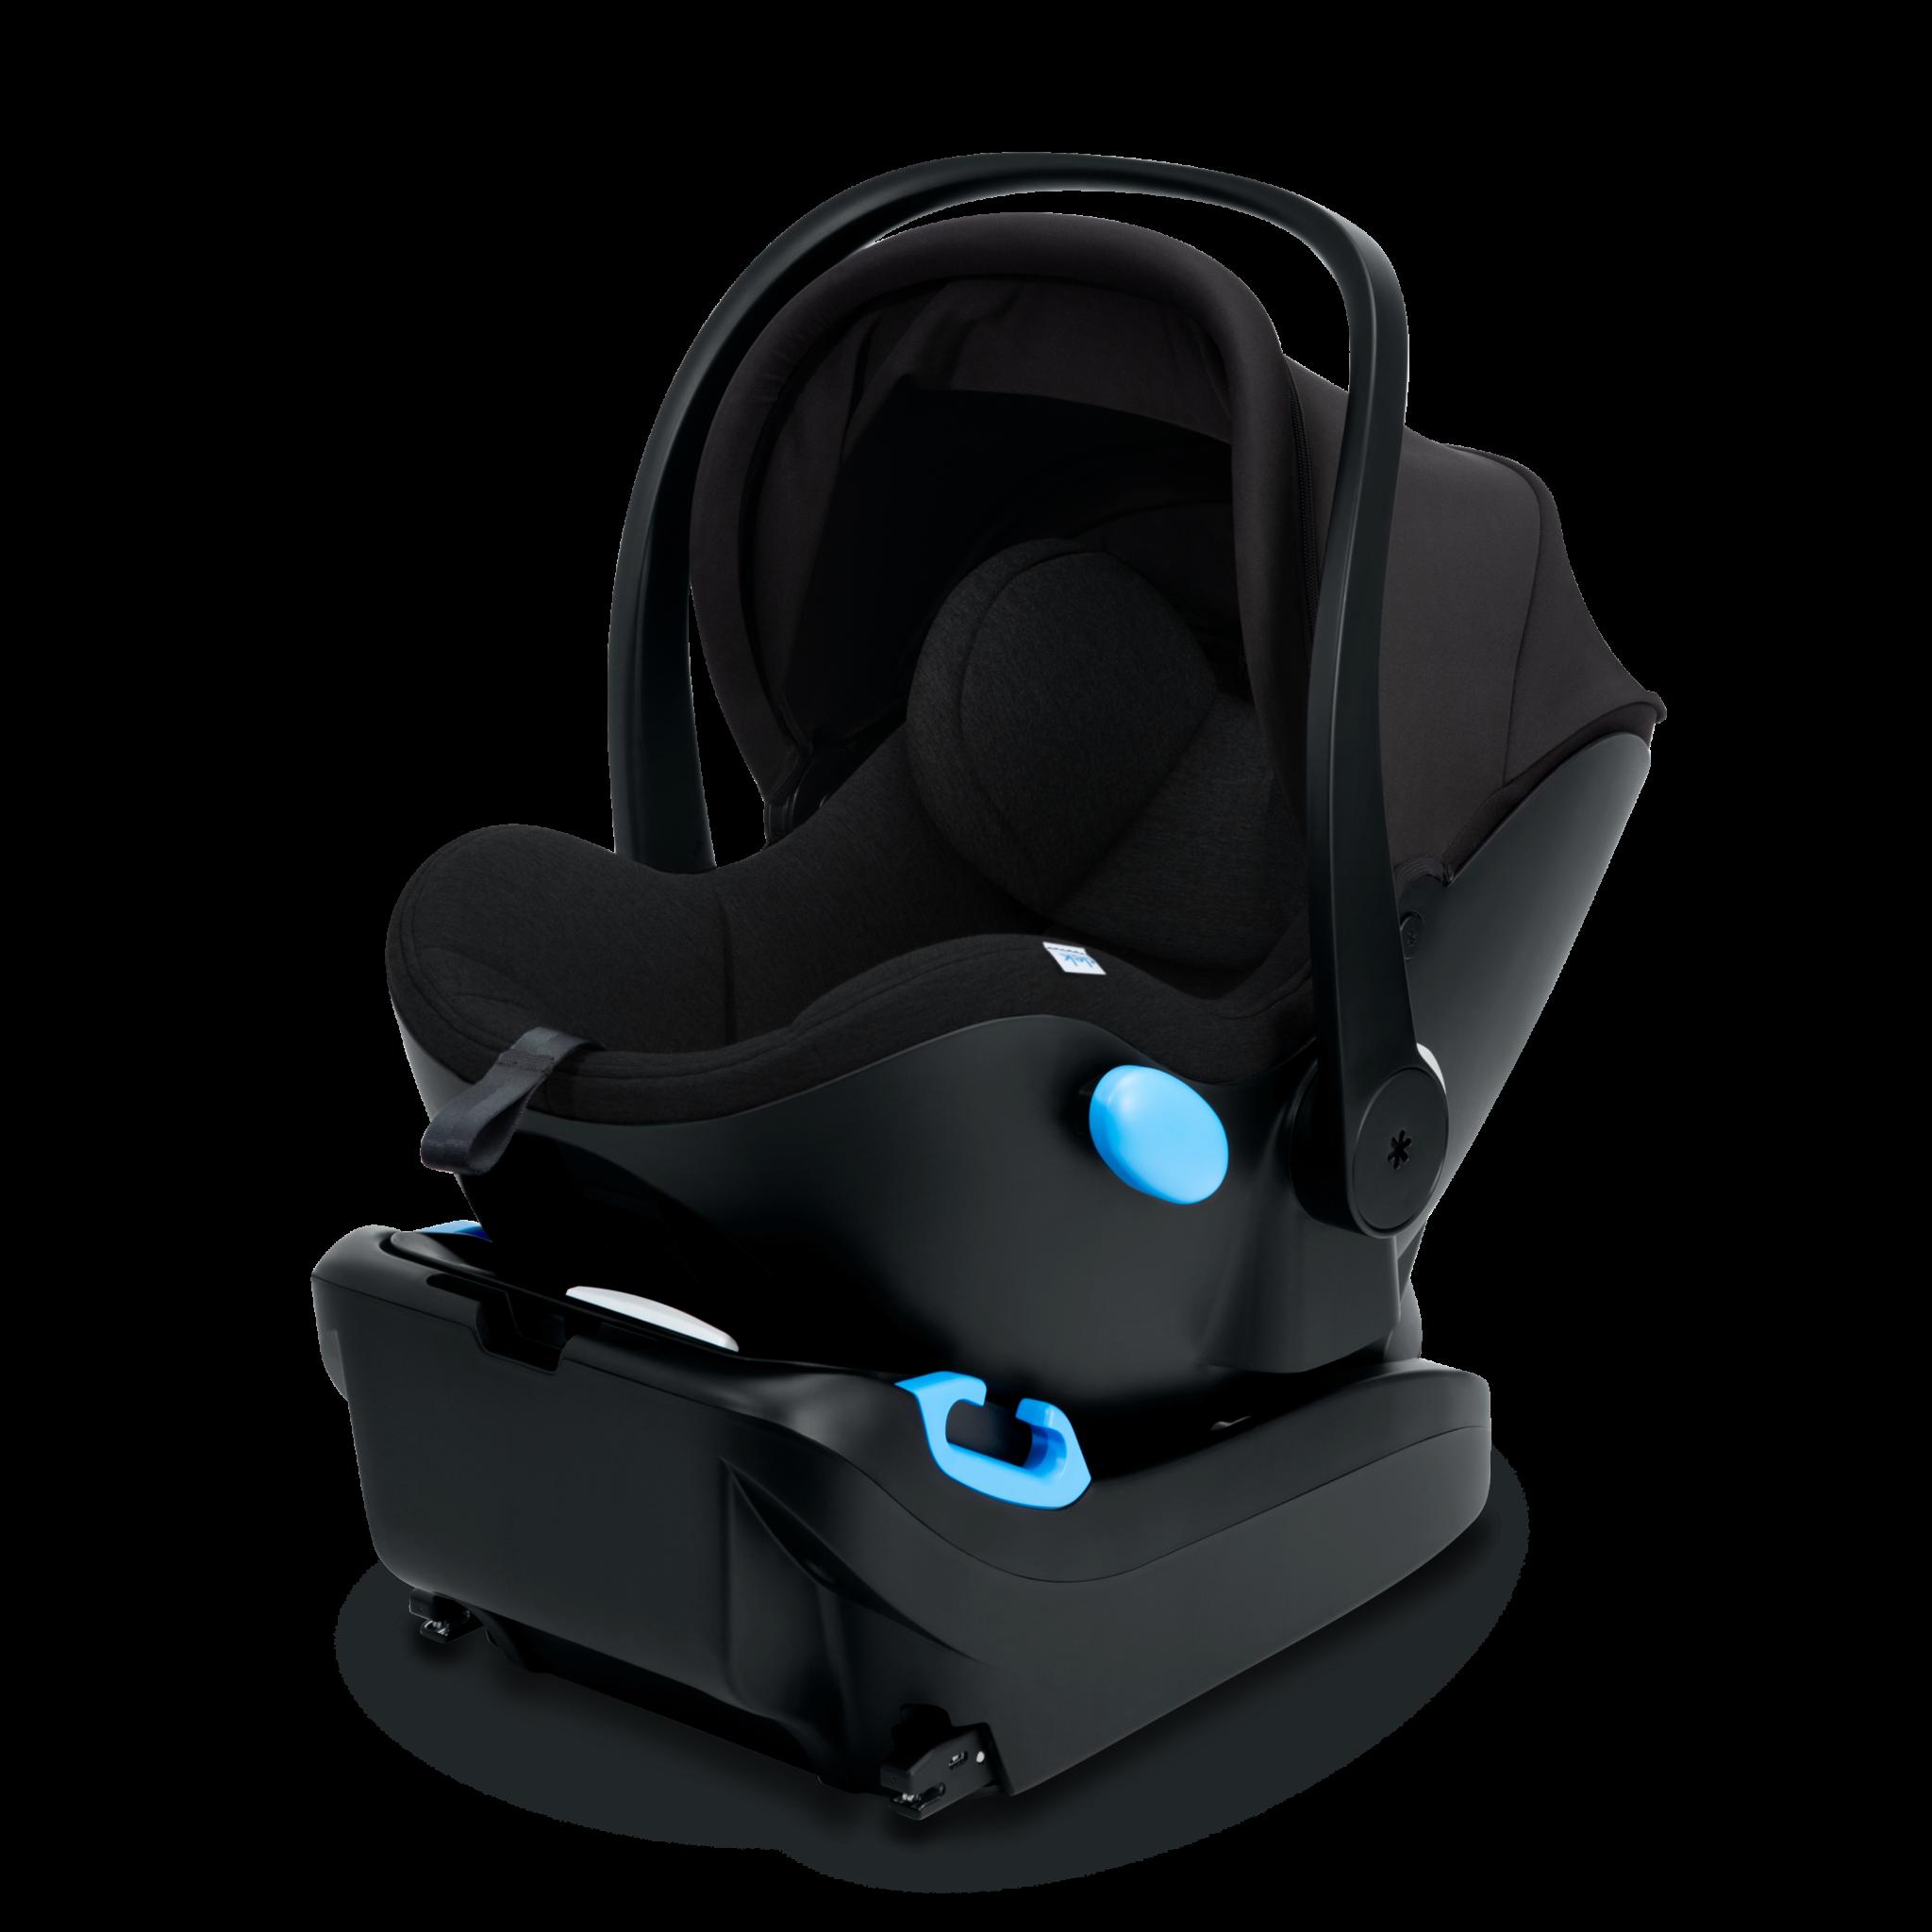 CLEK Liing Infant Car Seat